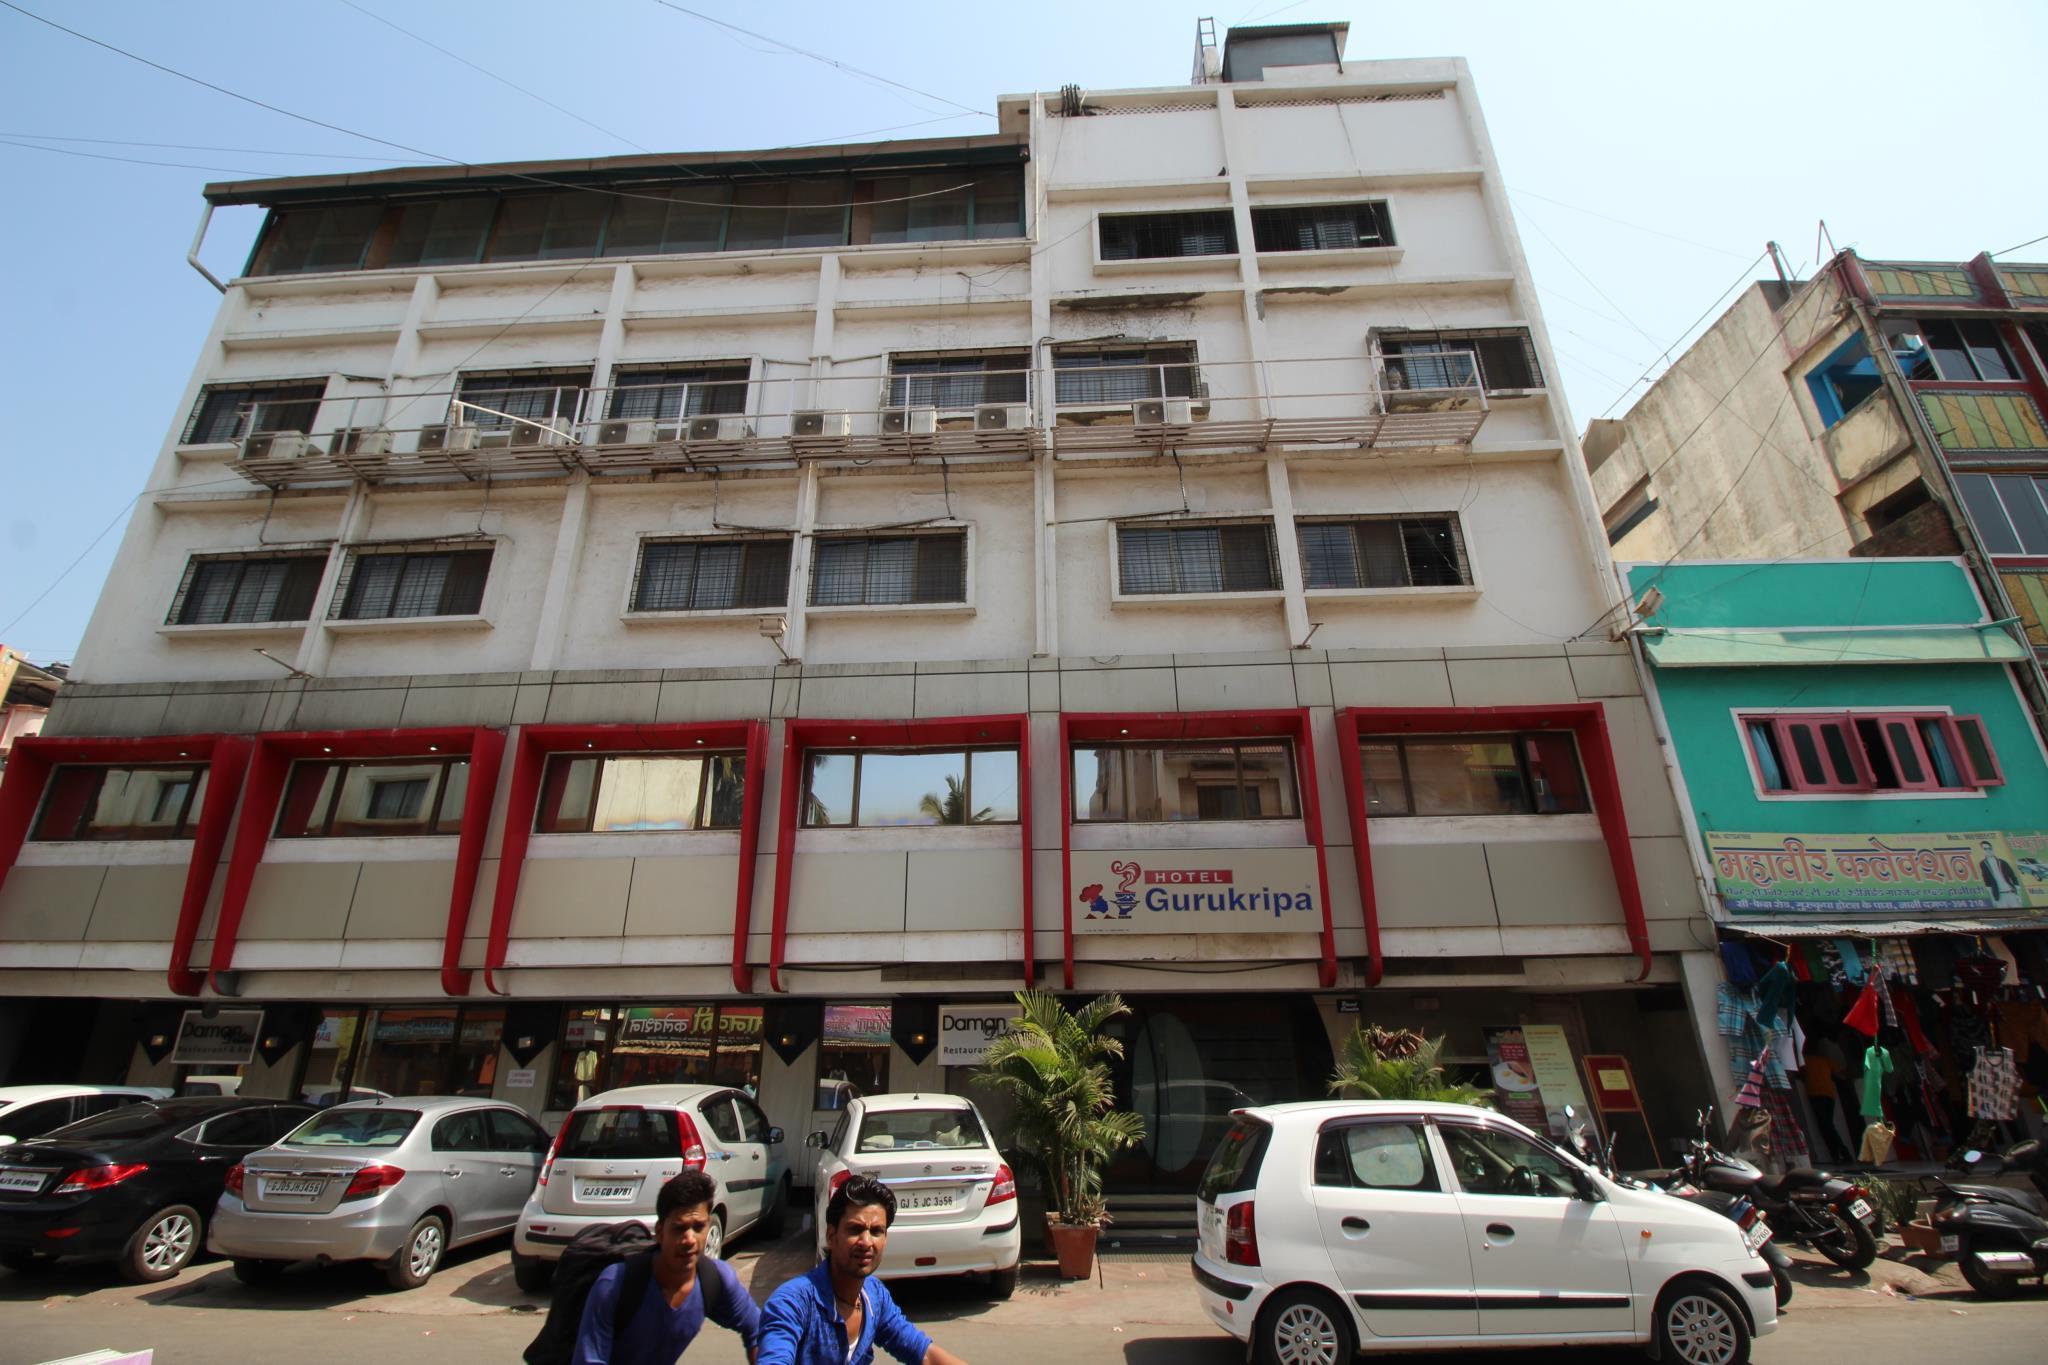 Hotel Gurukripa Daman